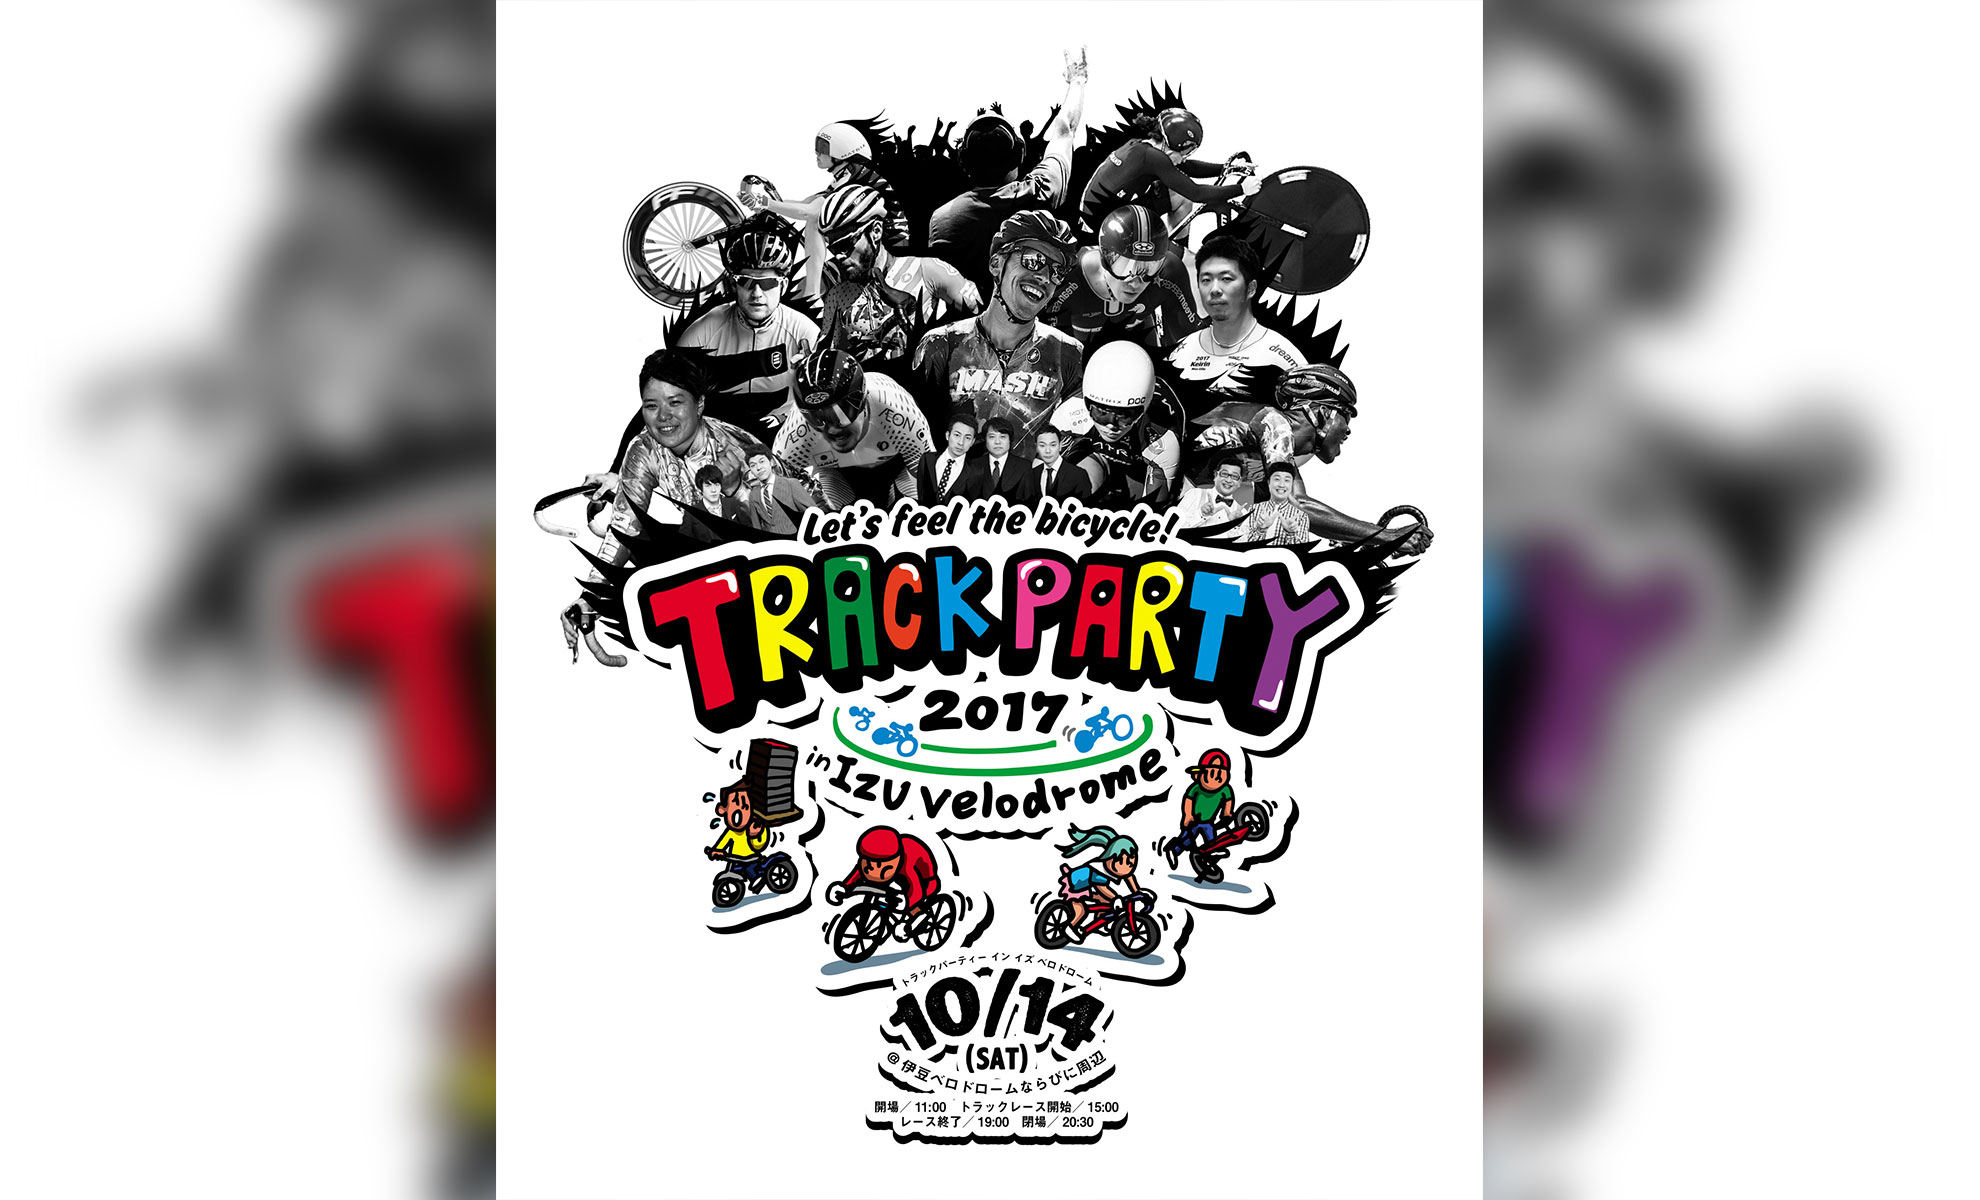 TRACK PARTY 2017×MASHSF